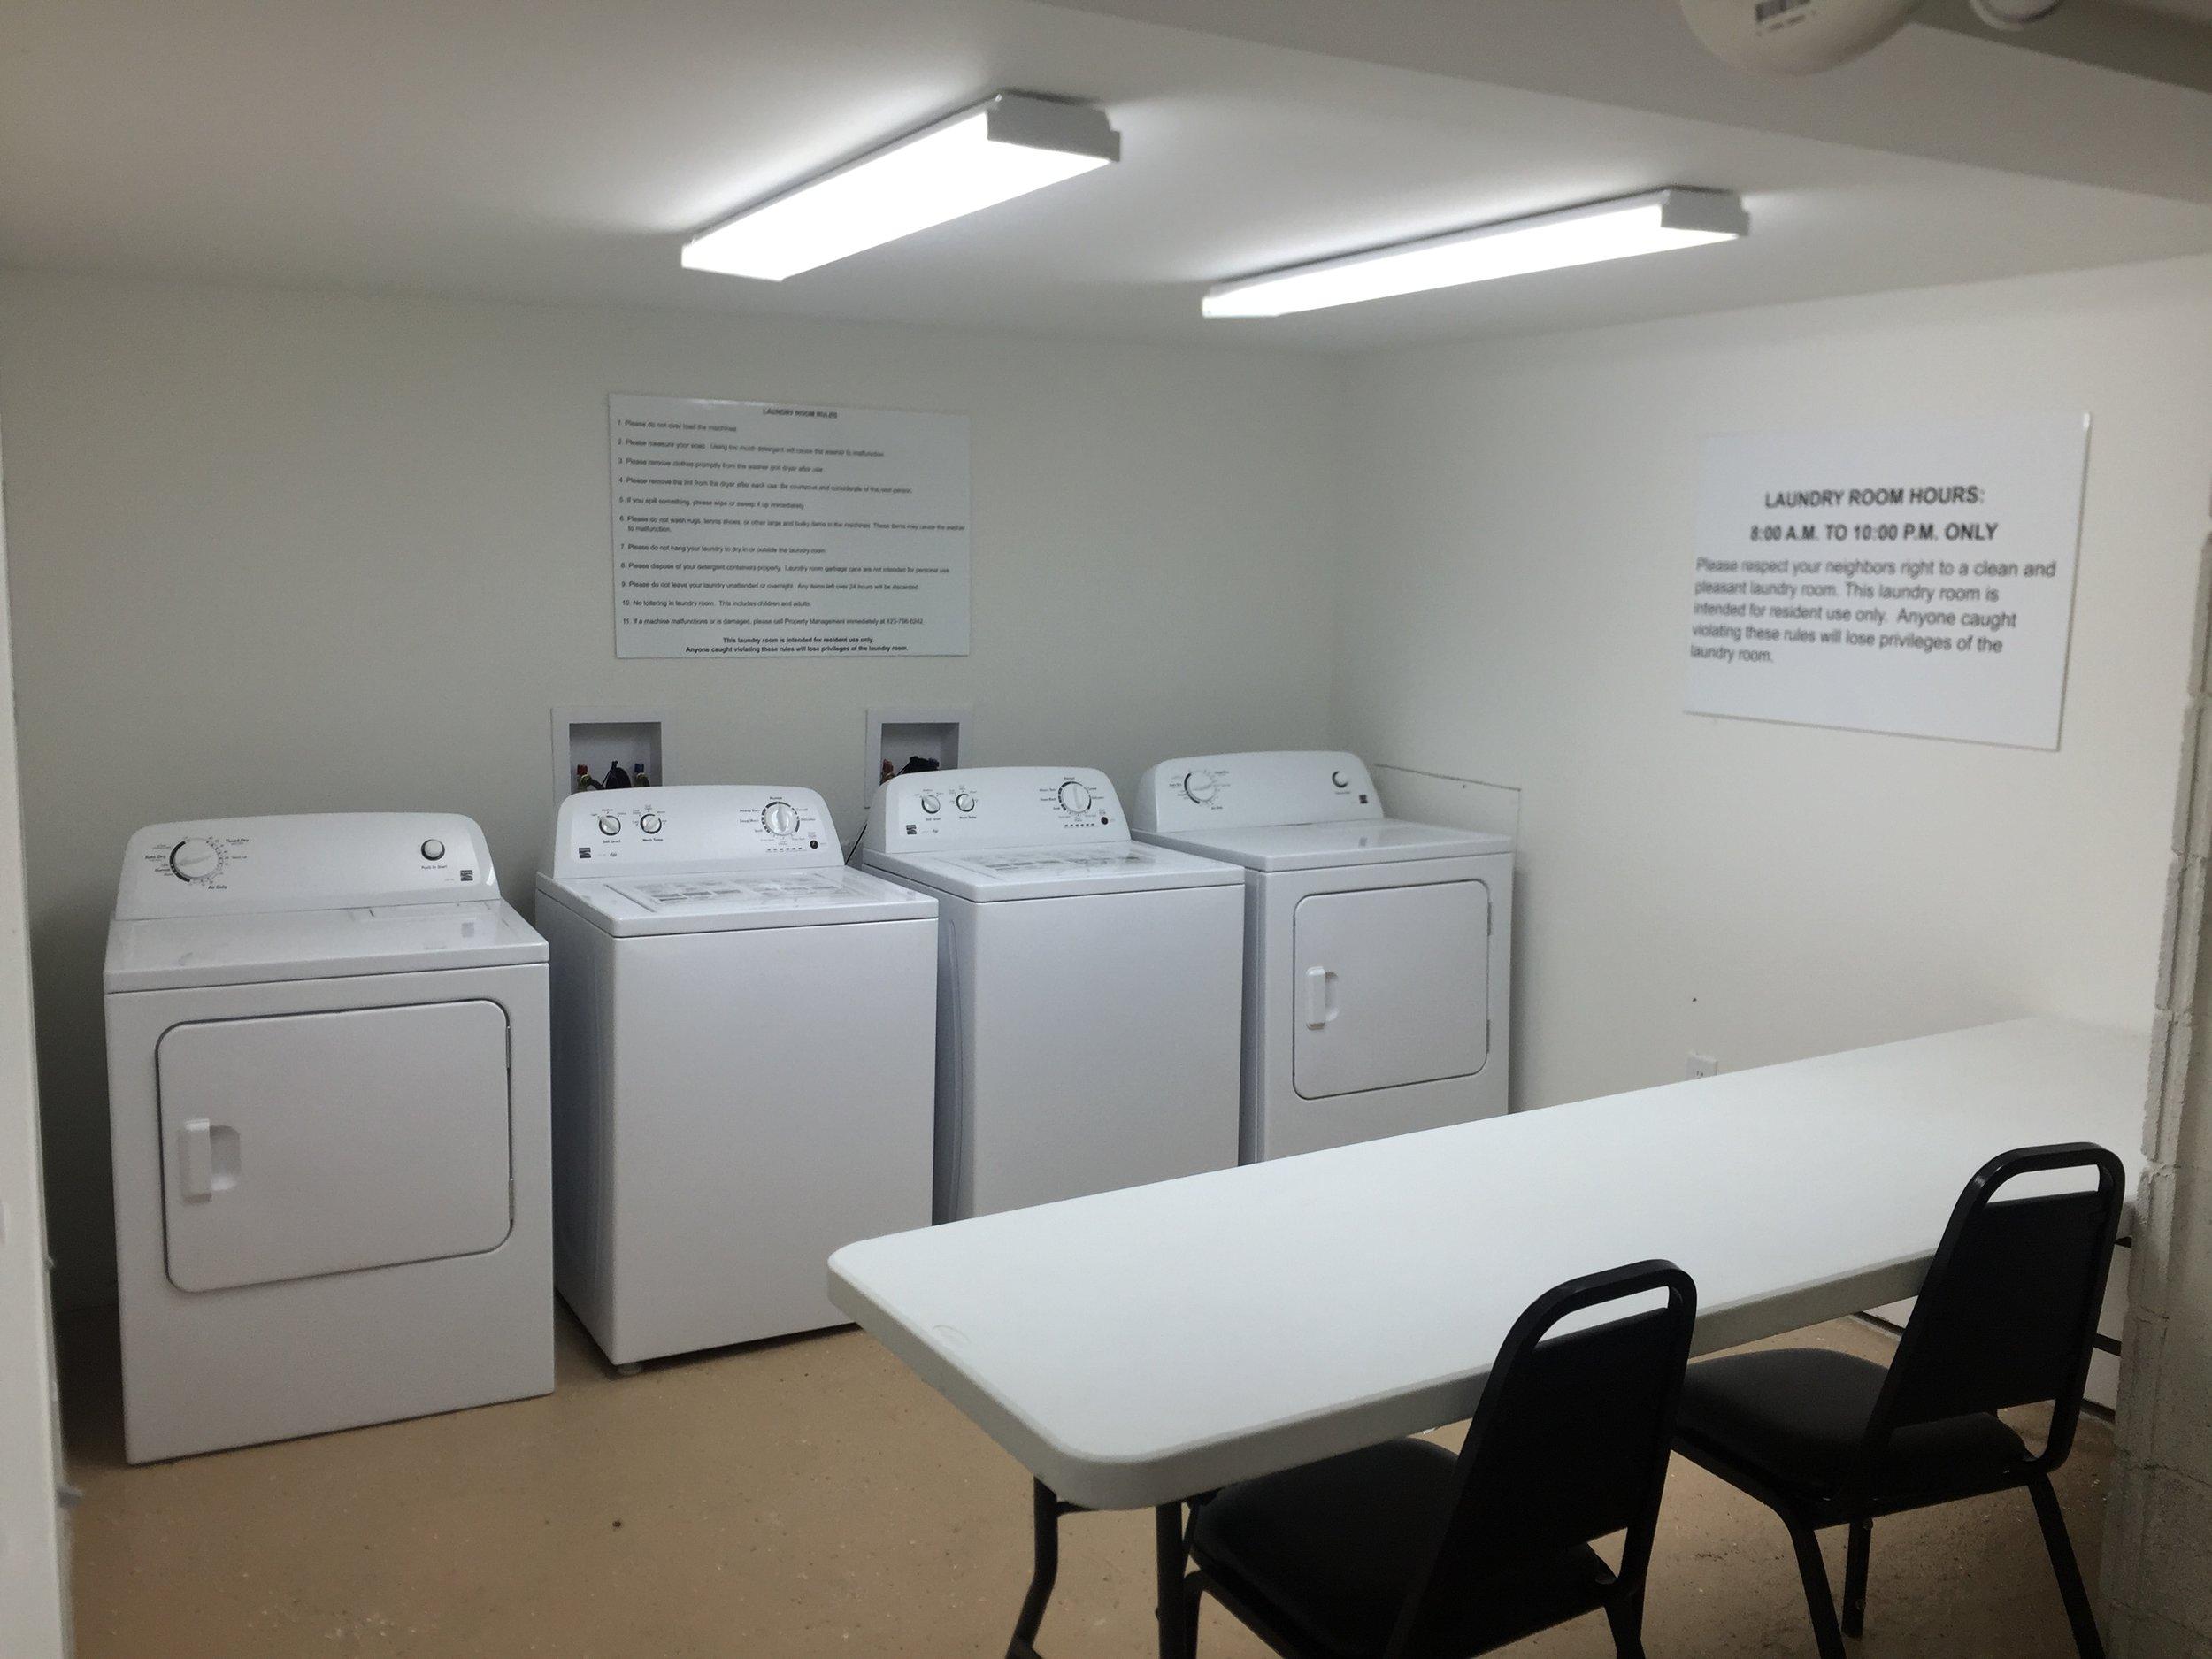 522 - Laundry Room Pic.jpg